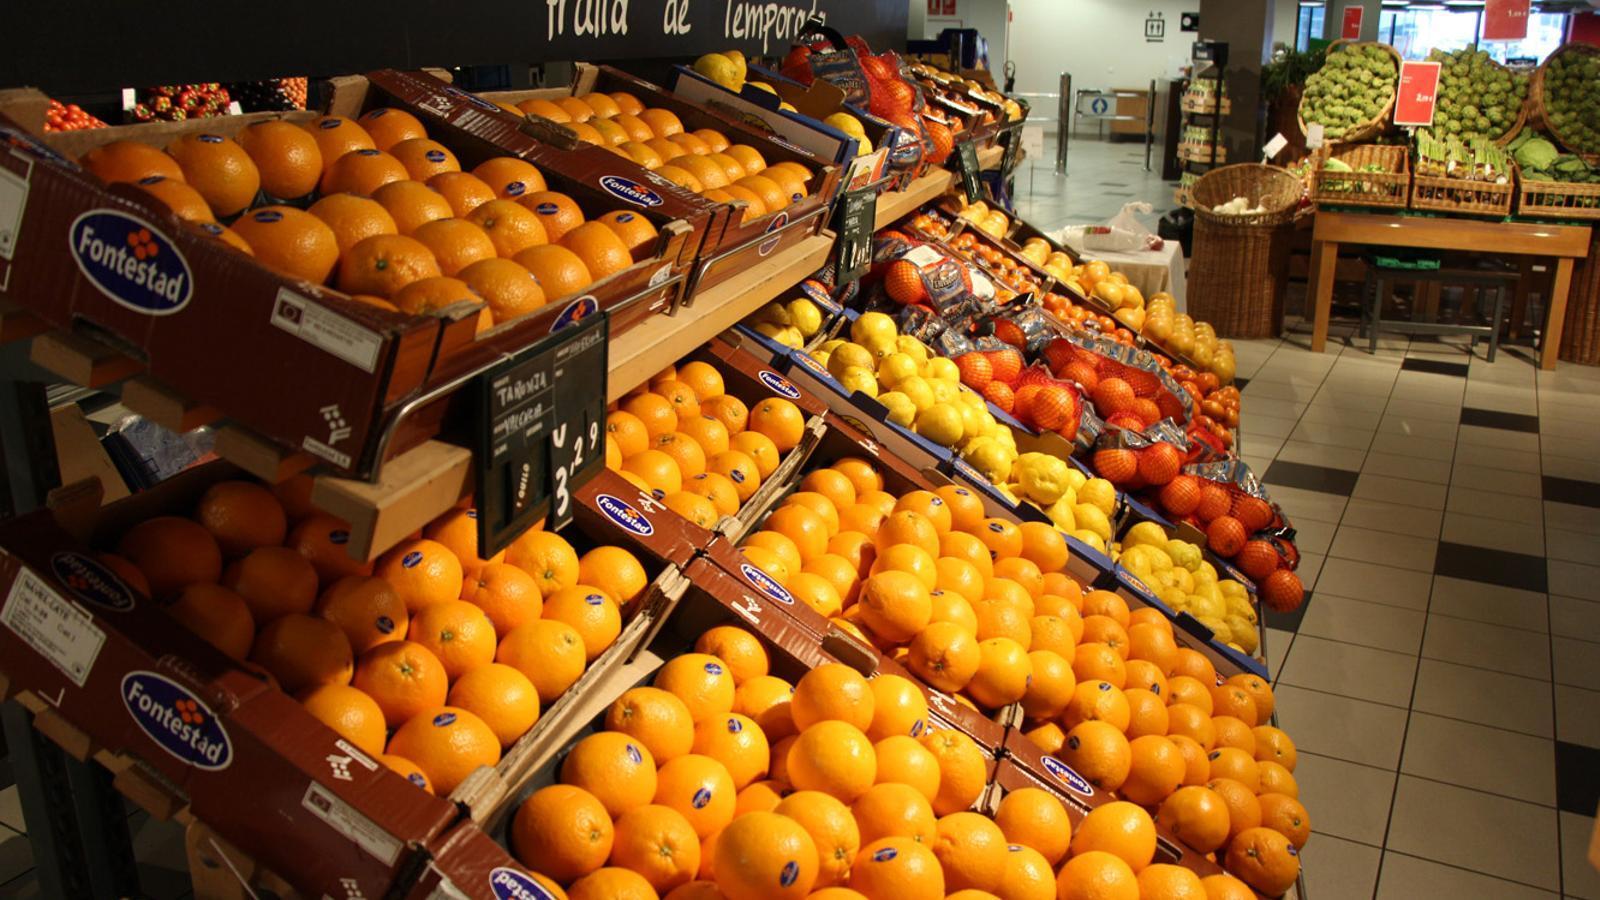 Fruita en un supermercat. / ARXIU ANA